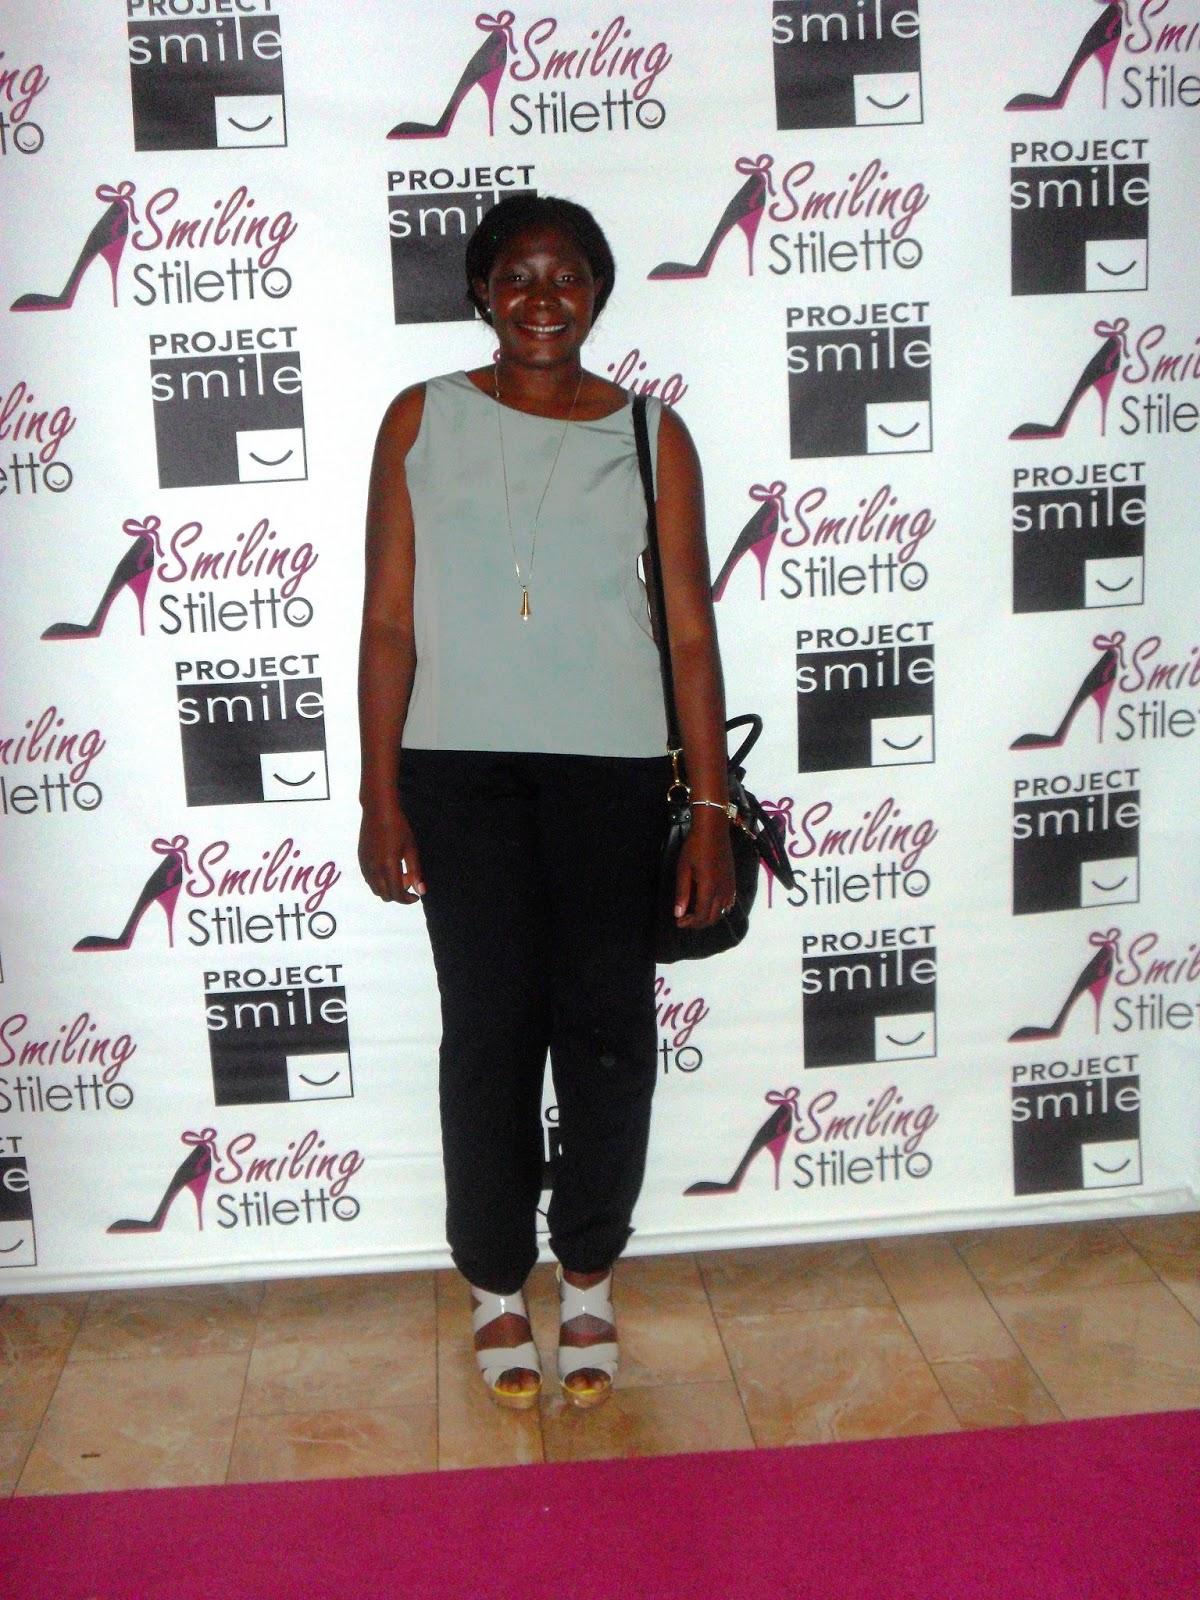 Smiling Stiletto Shoe Club Step Into Spring Fashion Show Benefits Charities Ma Petite Niche